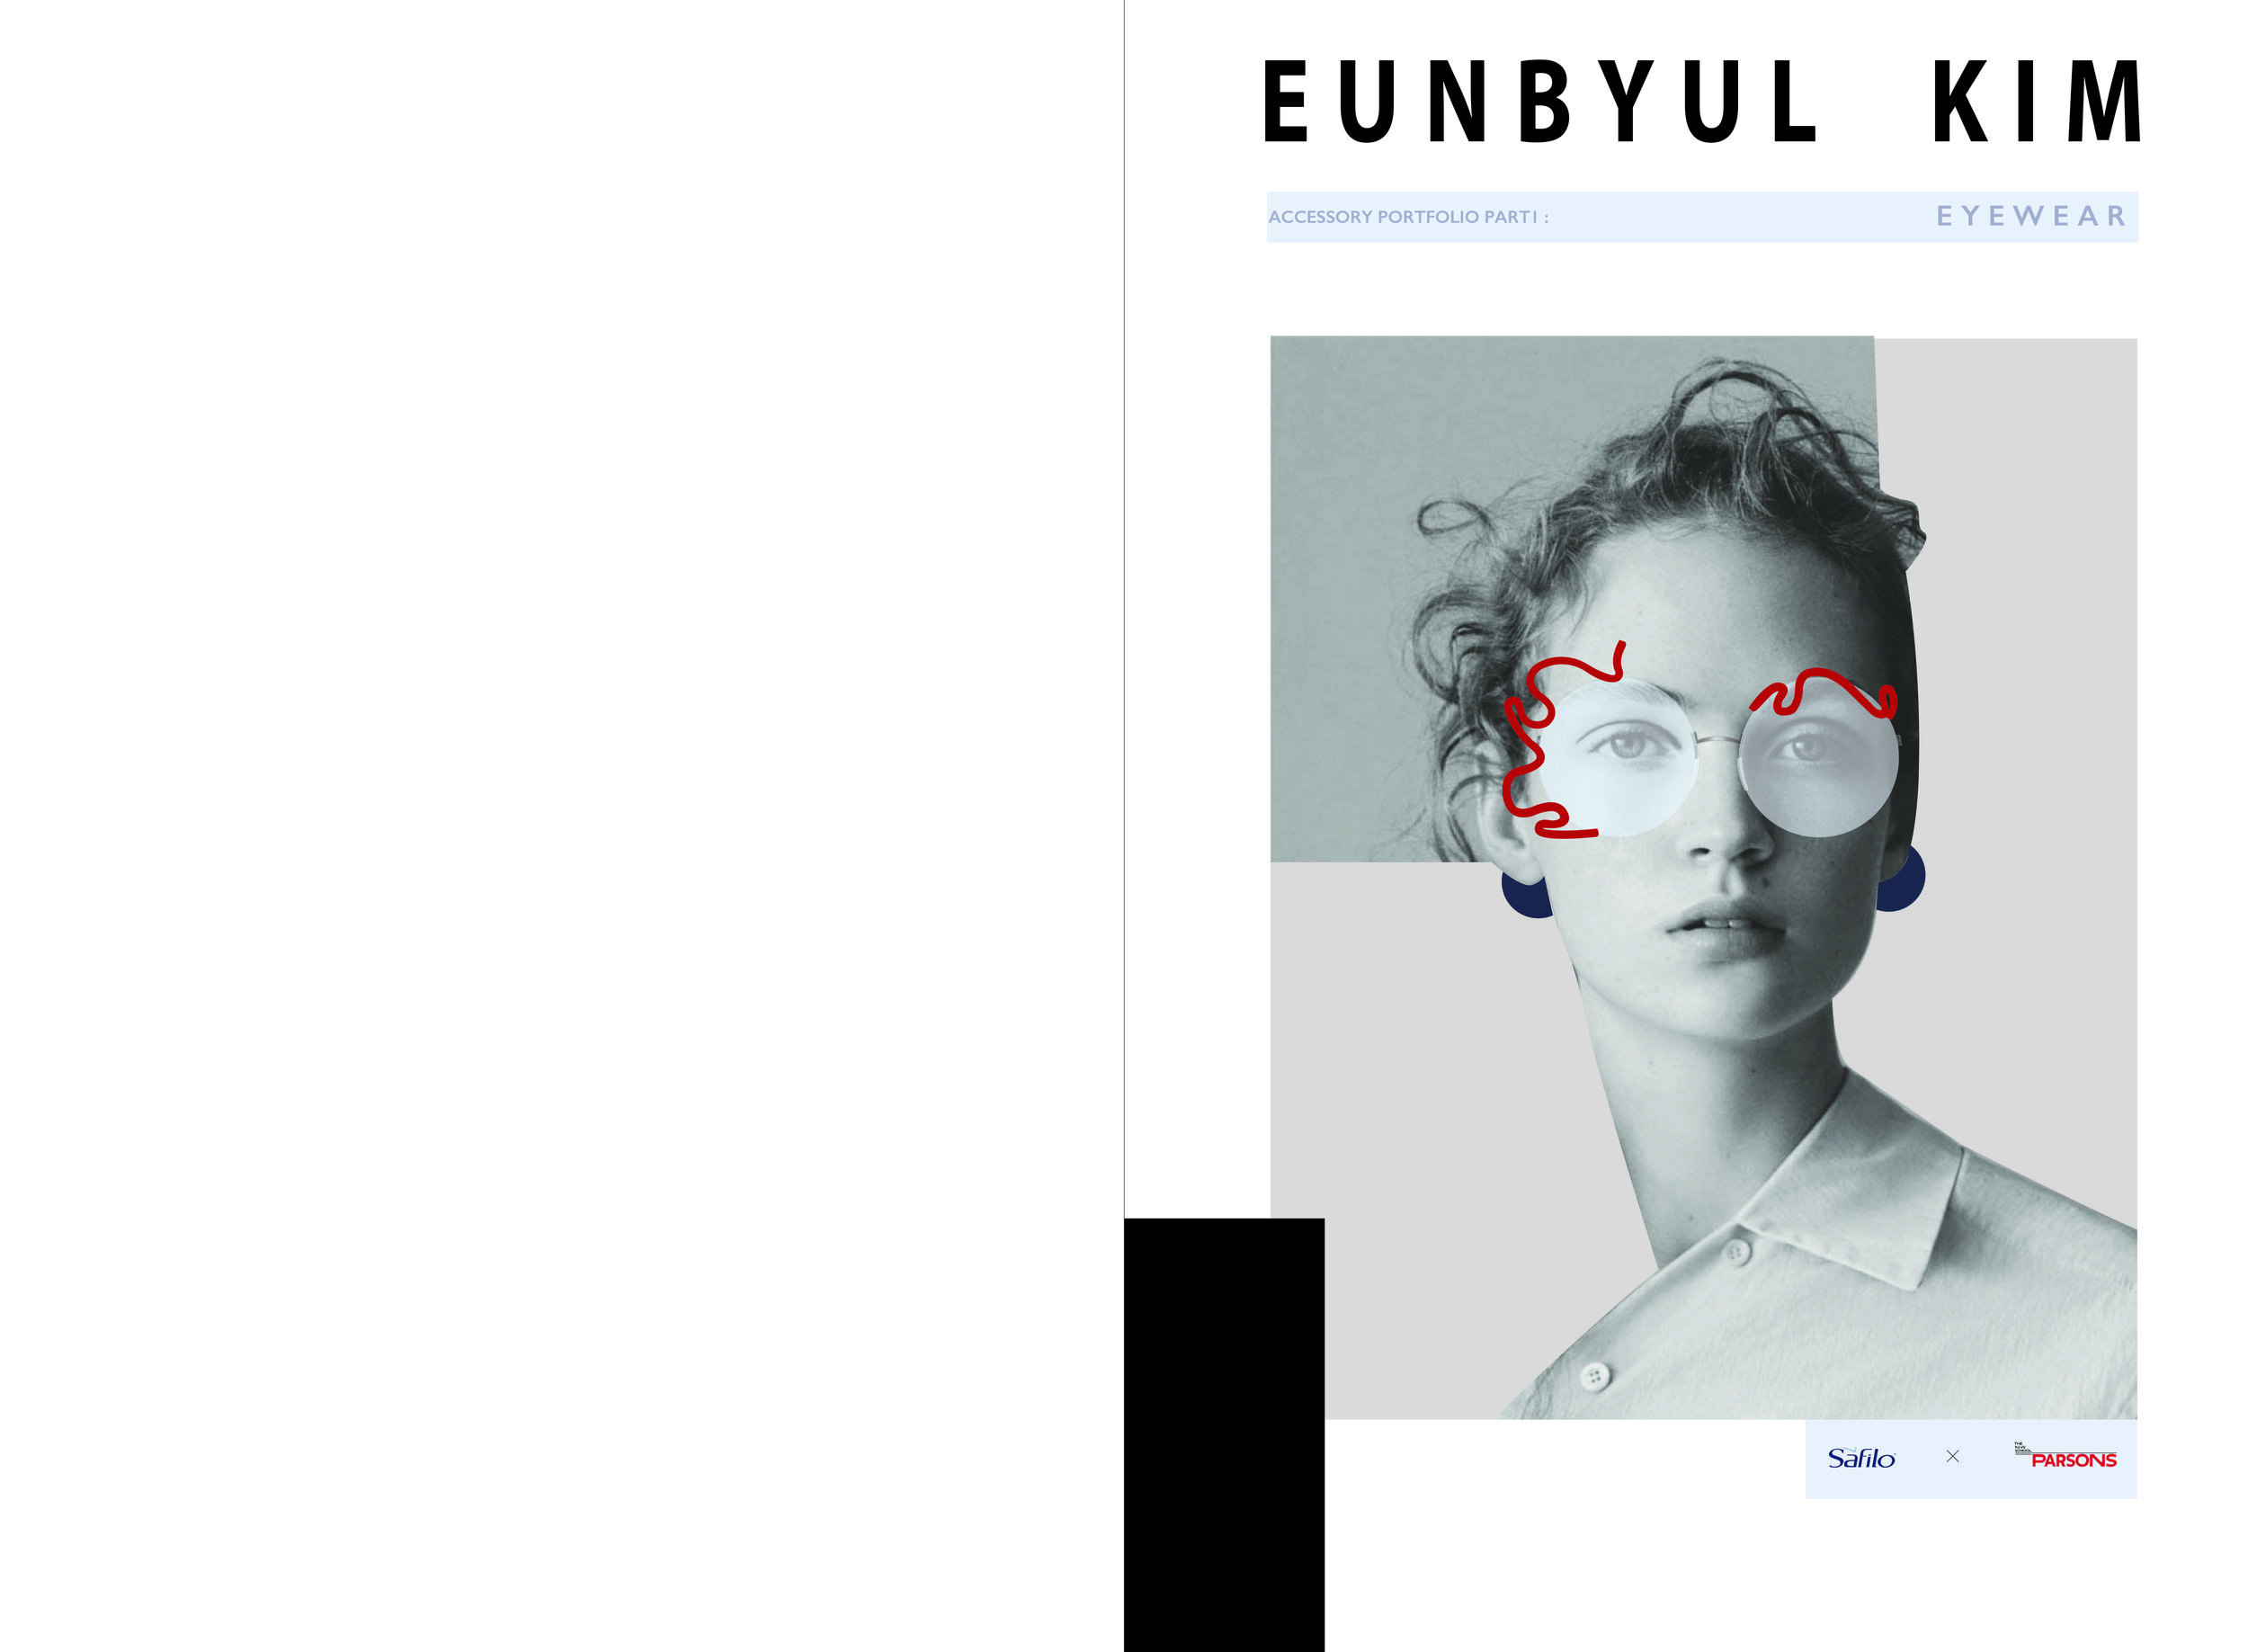 EUNBYUL_KIM_FFGS_Assets_Portfolio20.jpg